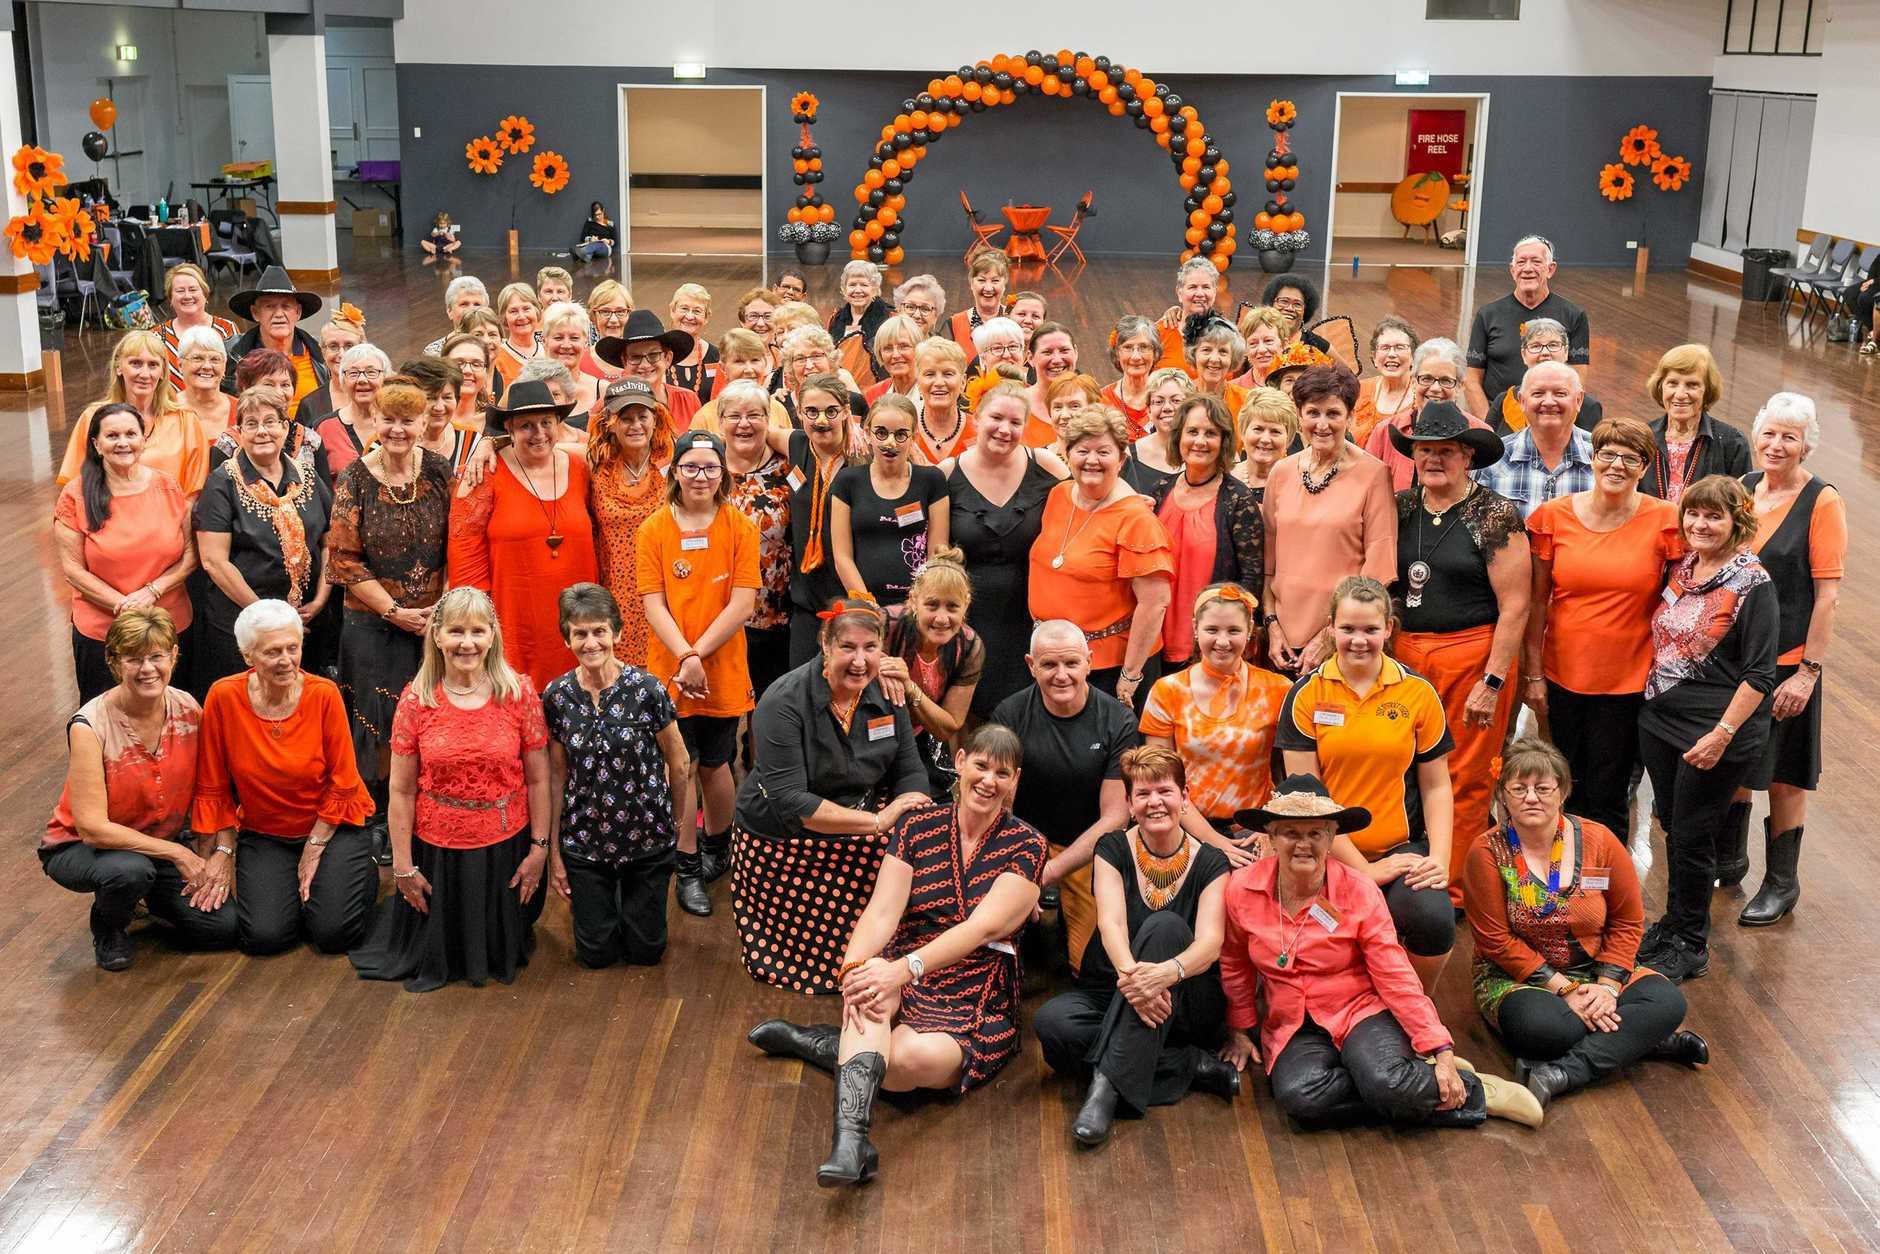 LINE DANCING: Dancers enjoy the 'Orange is the New Black' theme at Gordon Elliott's last workshop weekend at Boots 'n' All Line Dancing.